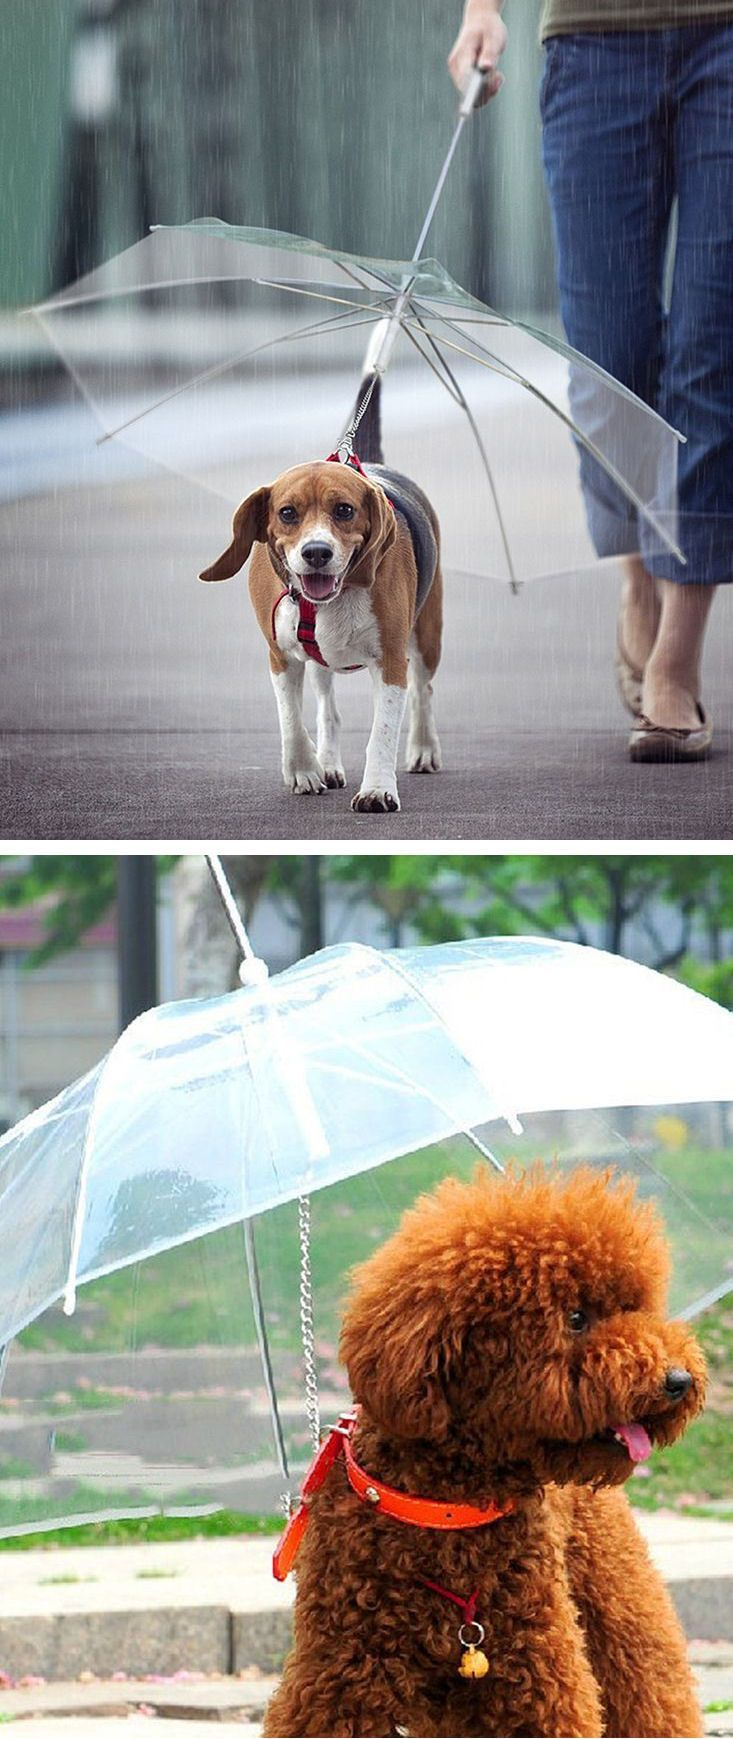 best 25 dog umbrella ideas on pinterest doxin dog dog beds and